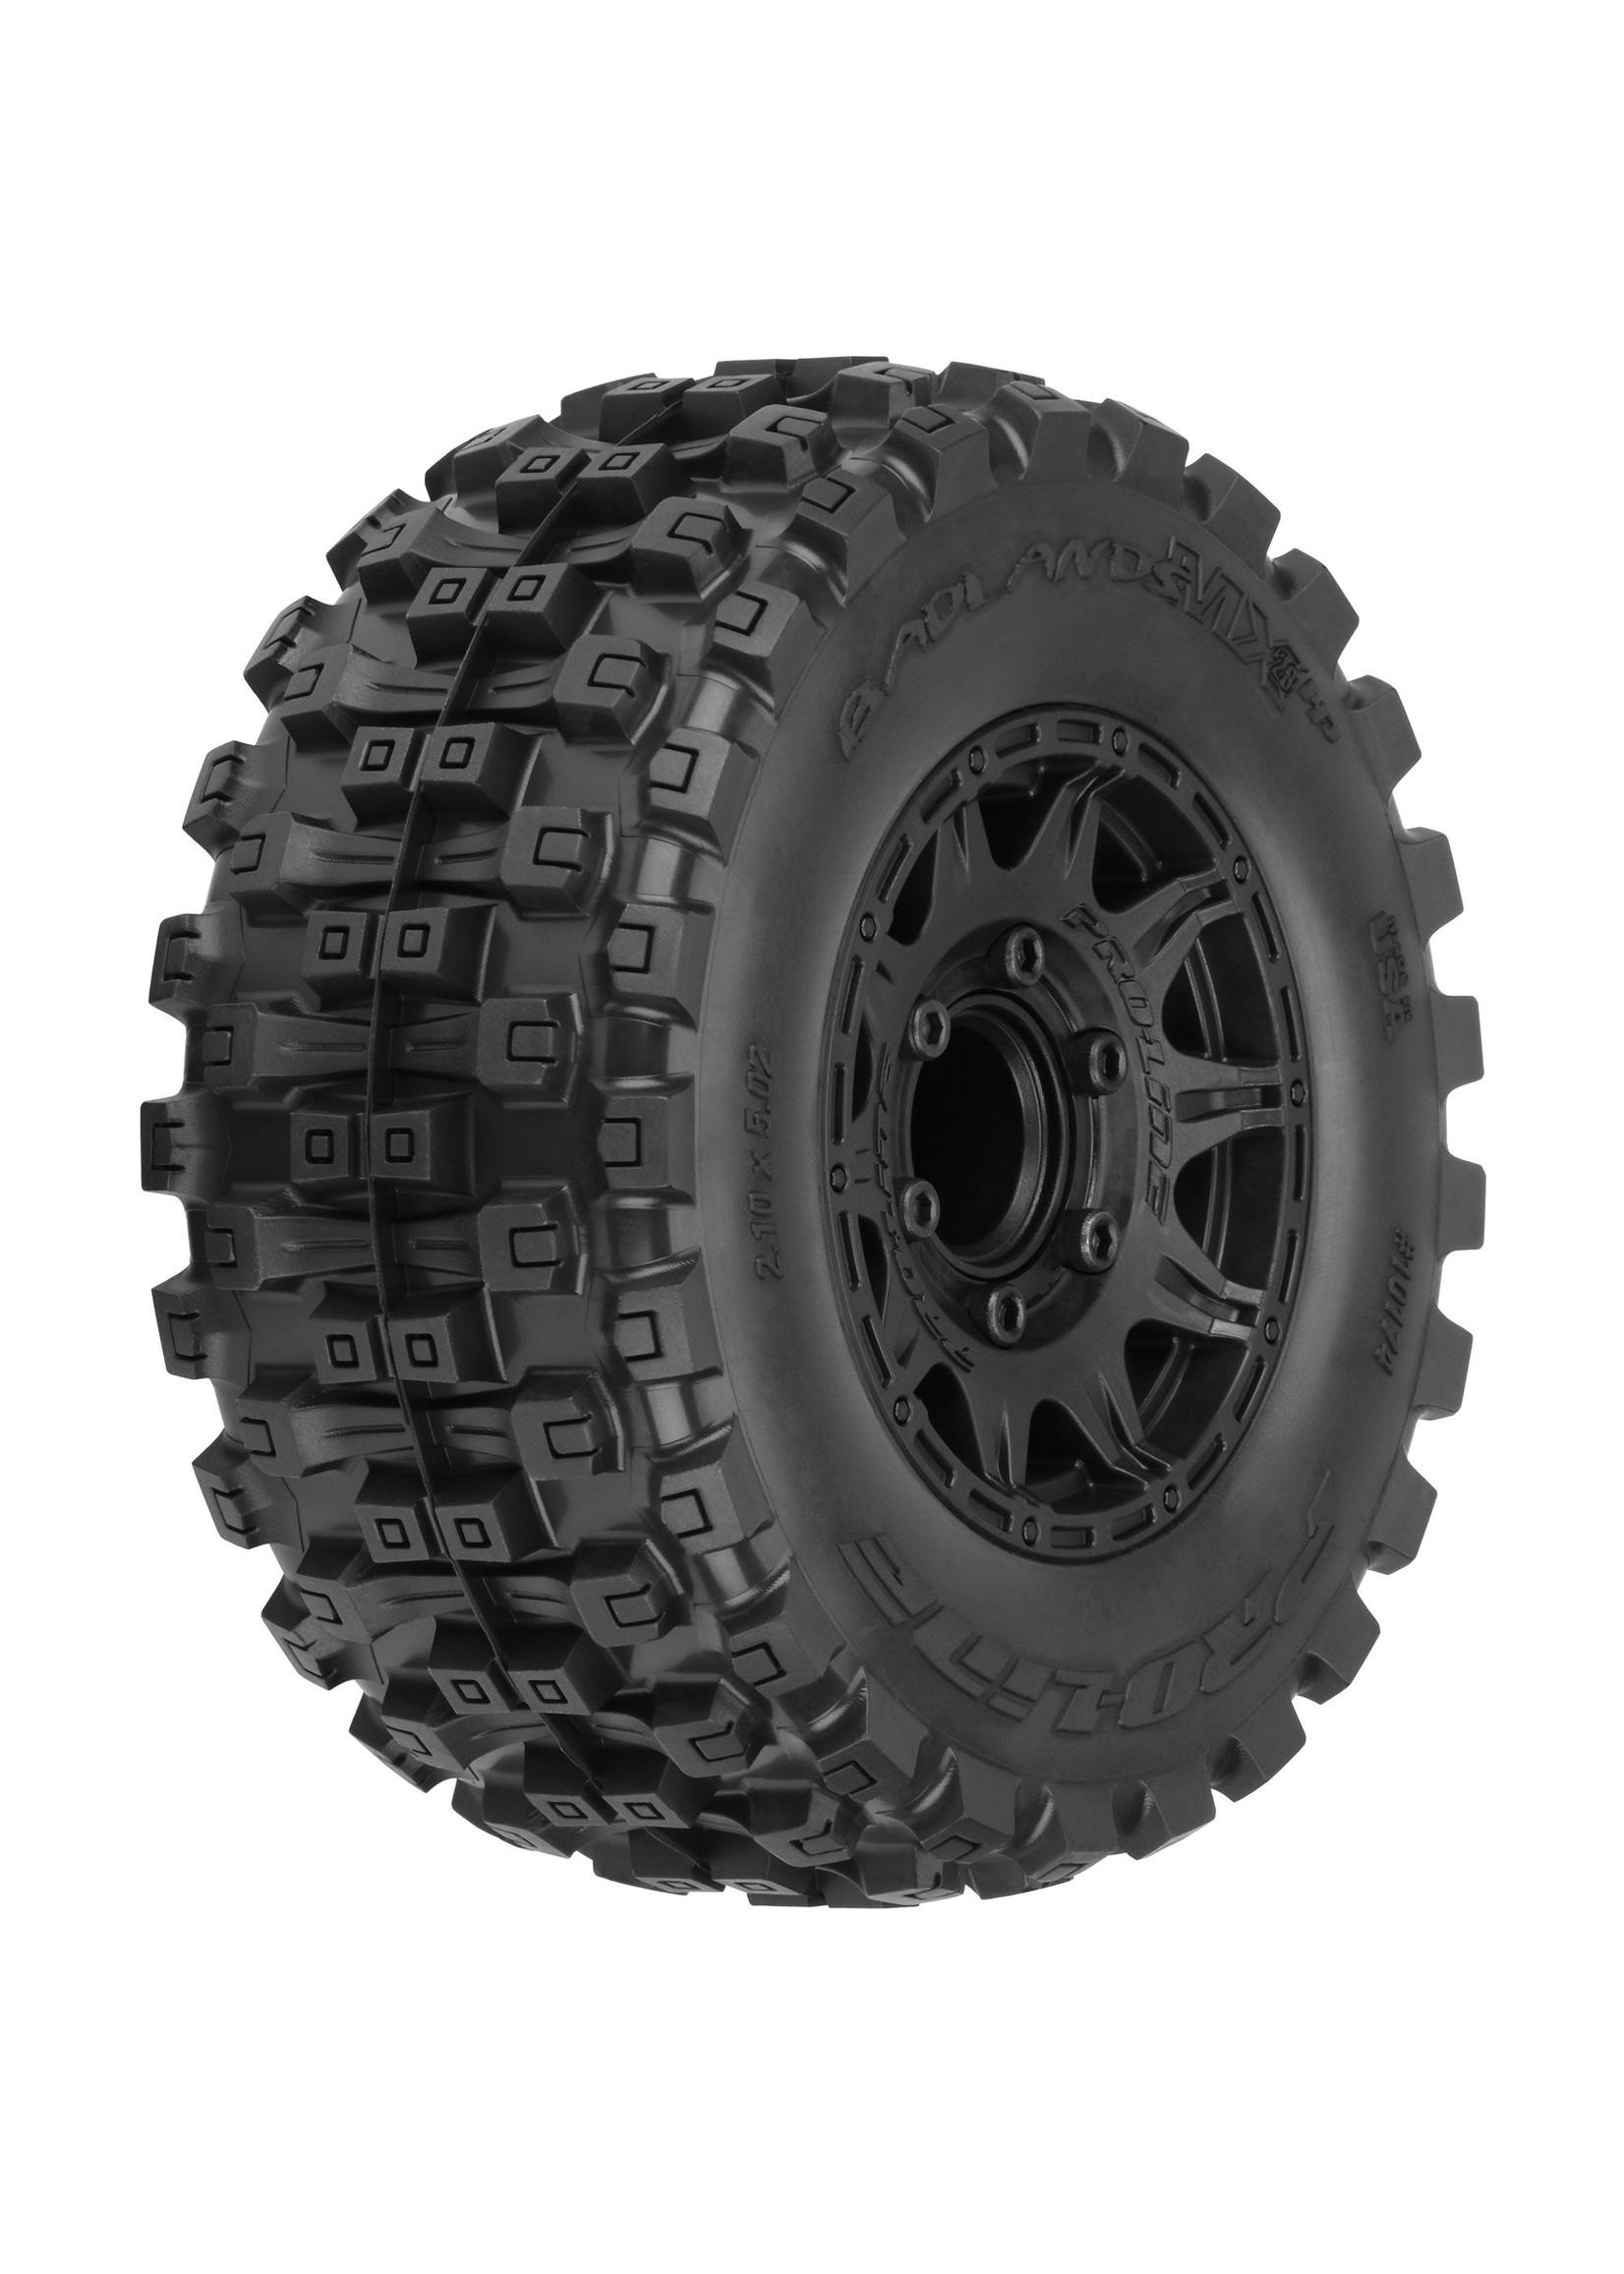 "Pro-Line Racing PRO1017410 Pro-Line Badlands MX28 HP 2.8"" BELTED MTD Raid 6x30 F/R"